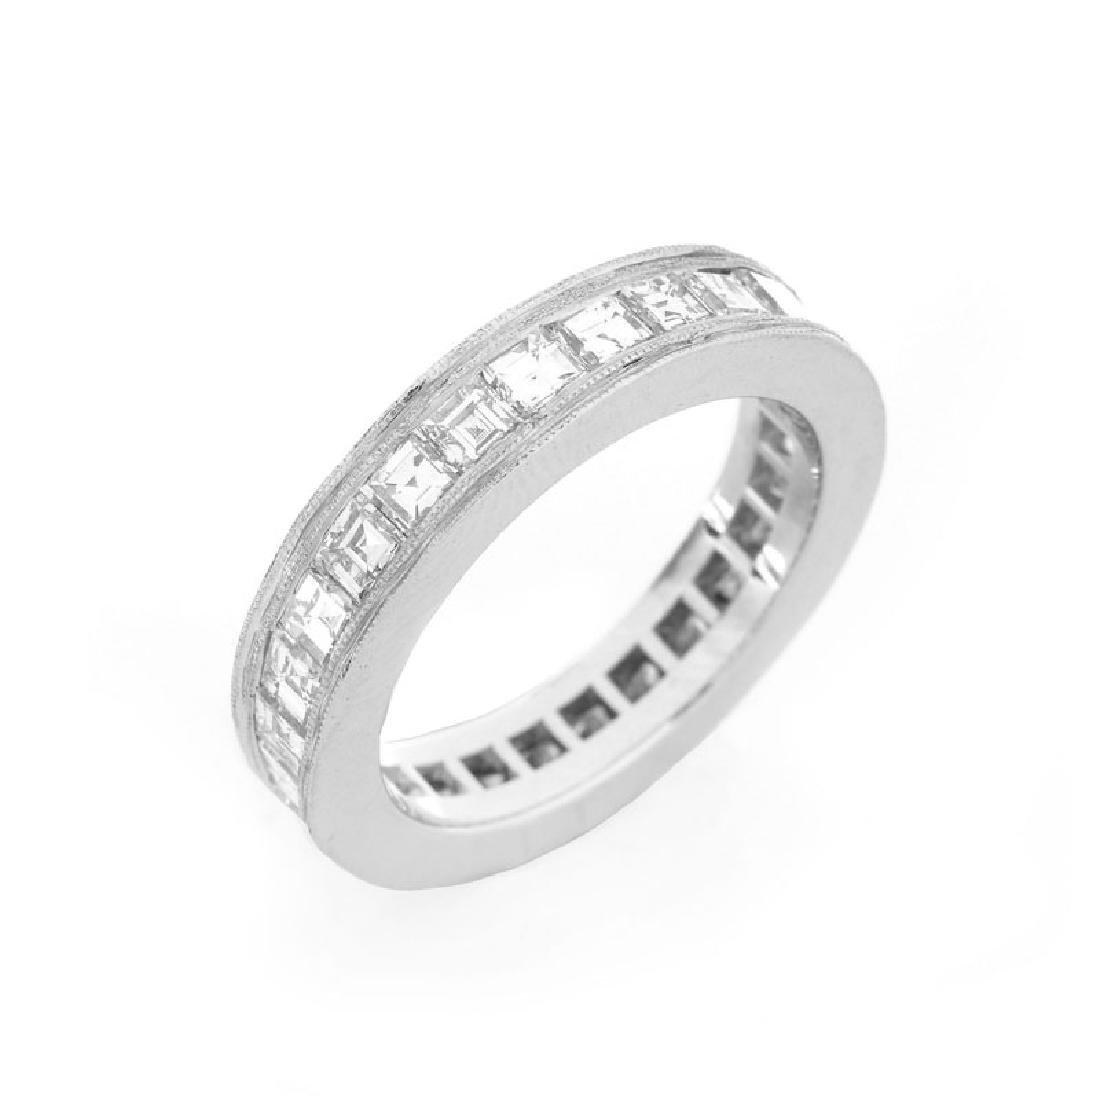 Approx. 4.0 Carat Square Cut Diamond and Platinum